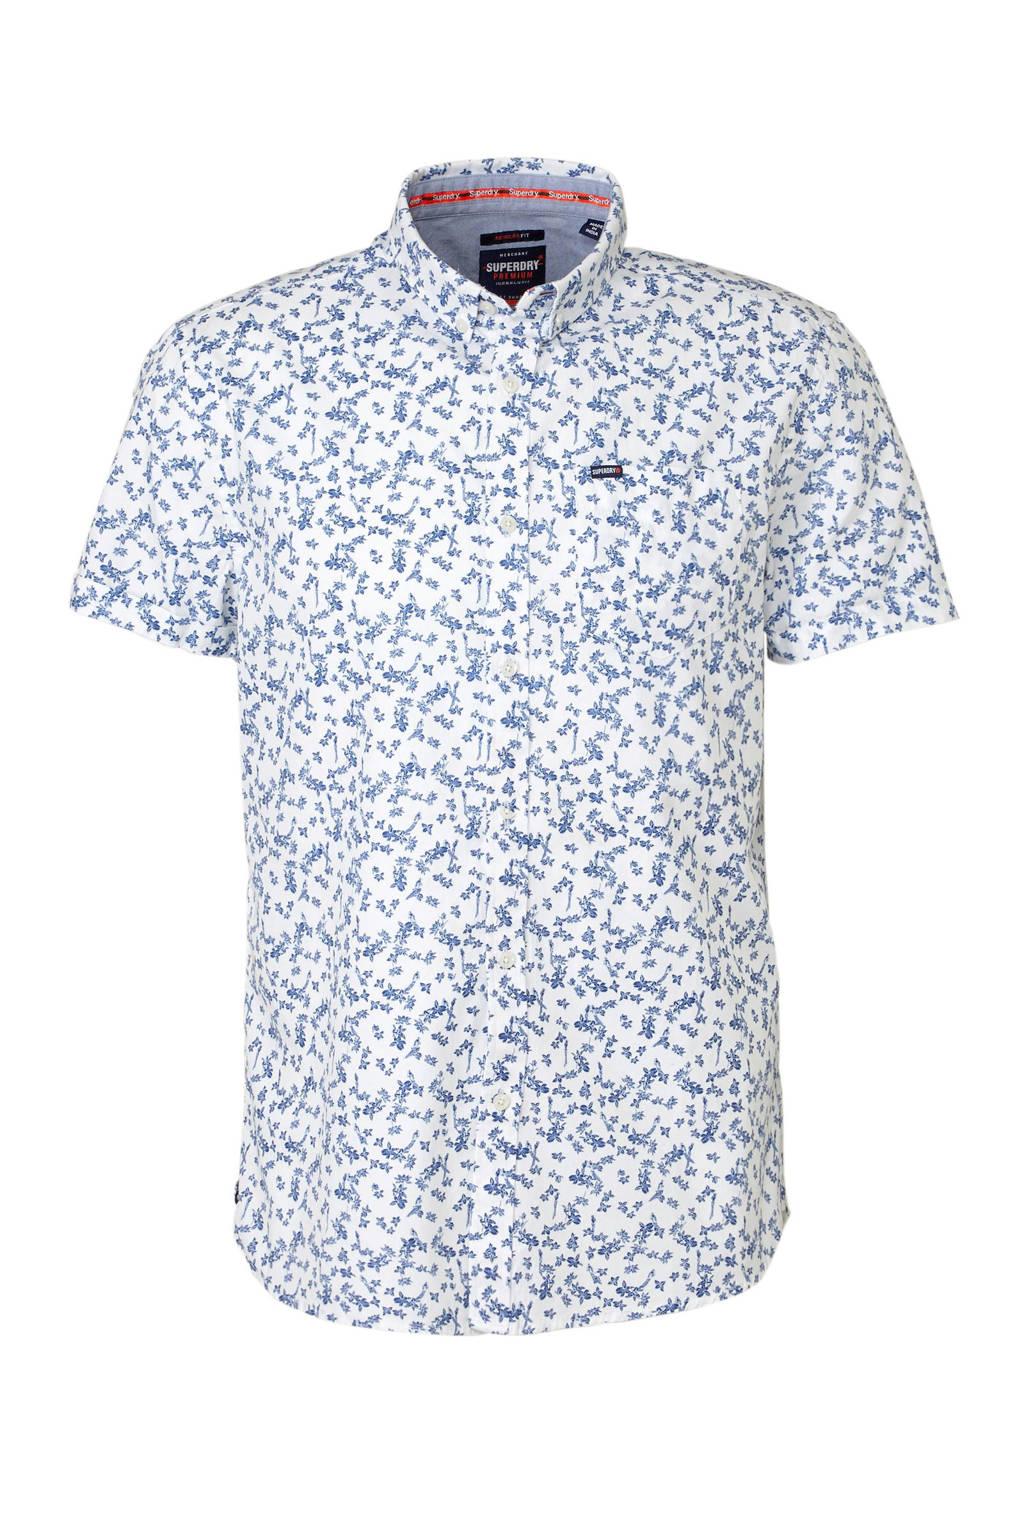 Superdry overhemd korte mouw, Wit/blauw